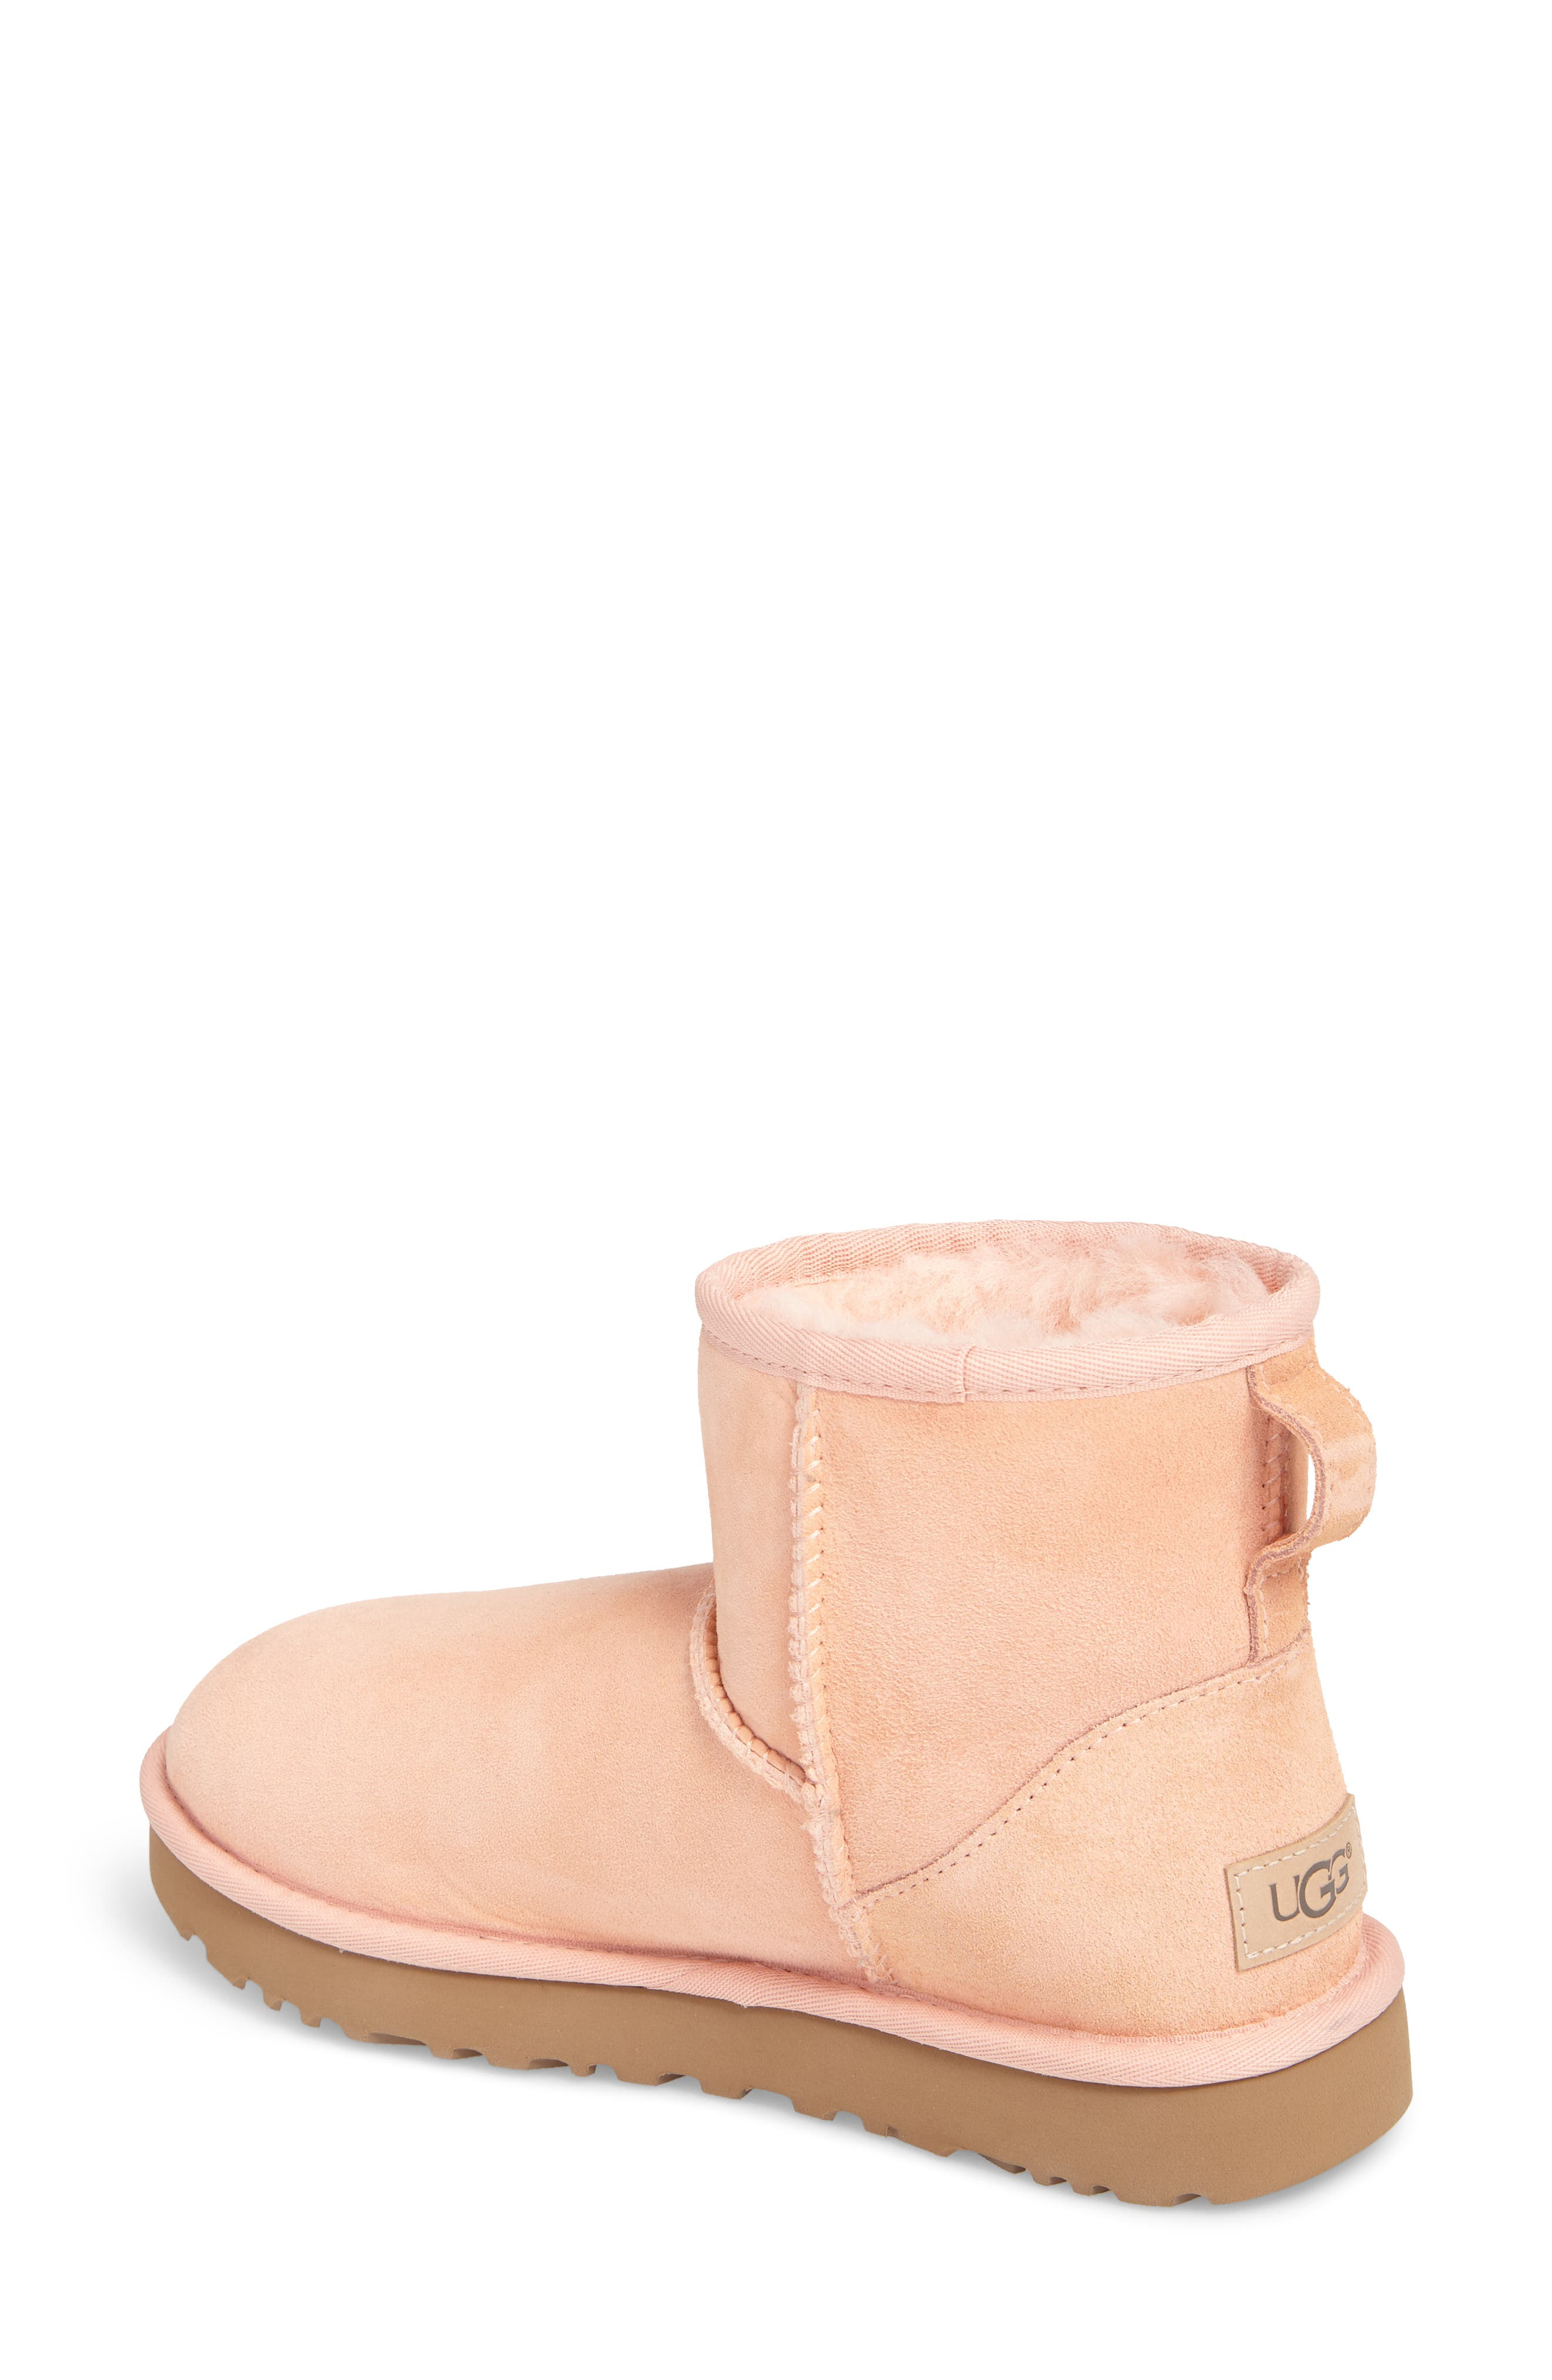 ,                             Classic Mini II Genuine Shearling Lined Boot,                             Alternate thumbnail 98, color,                             950